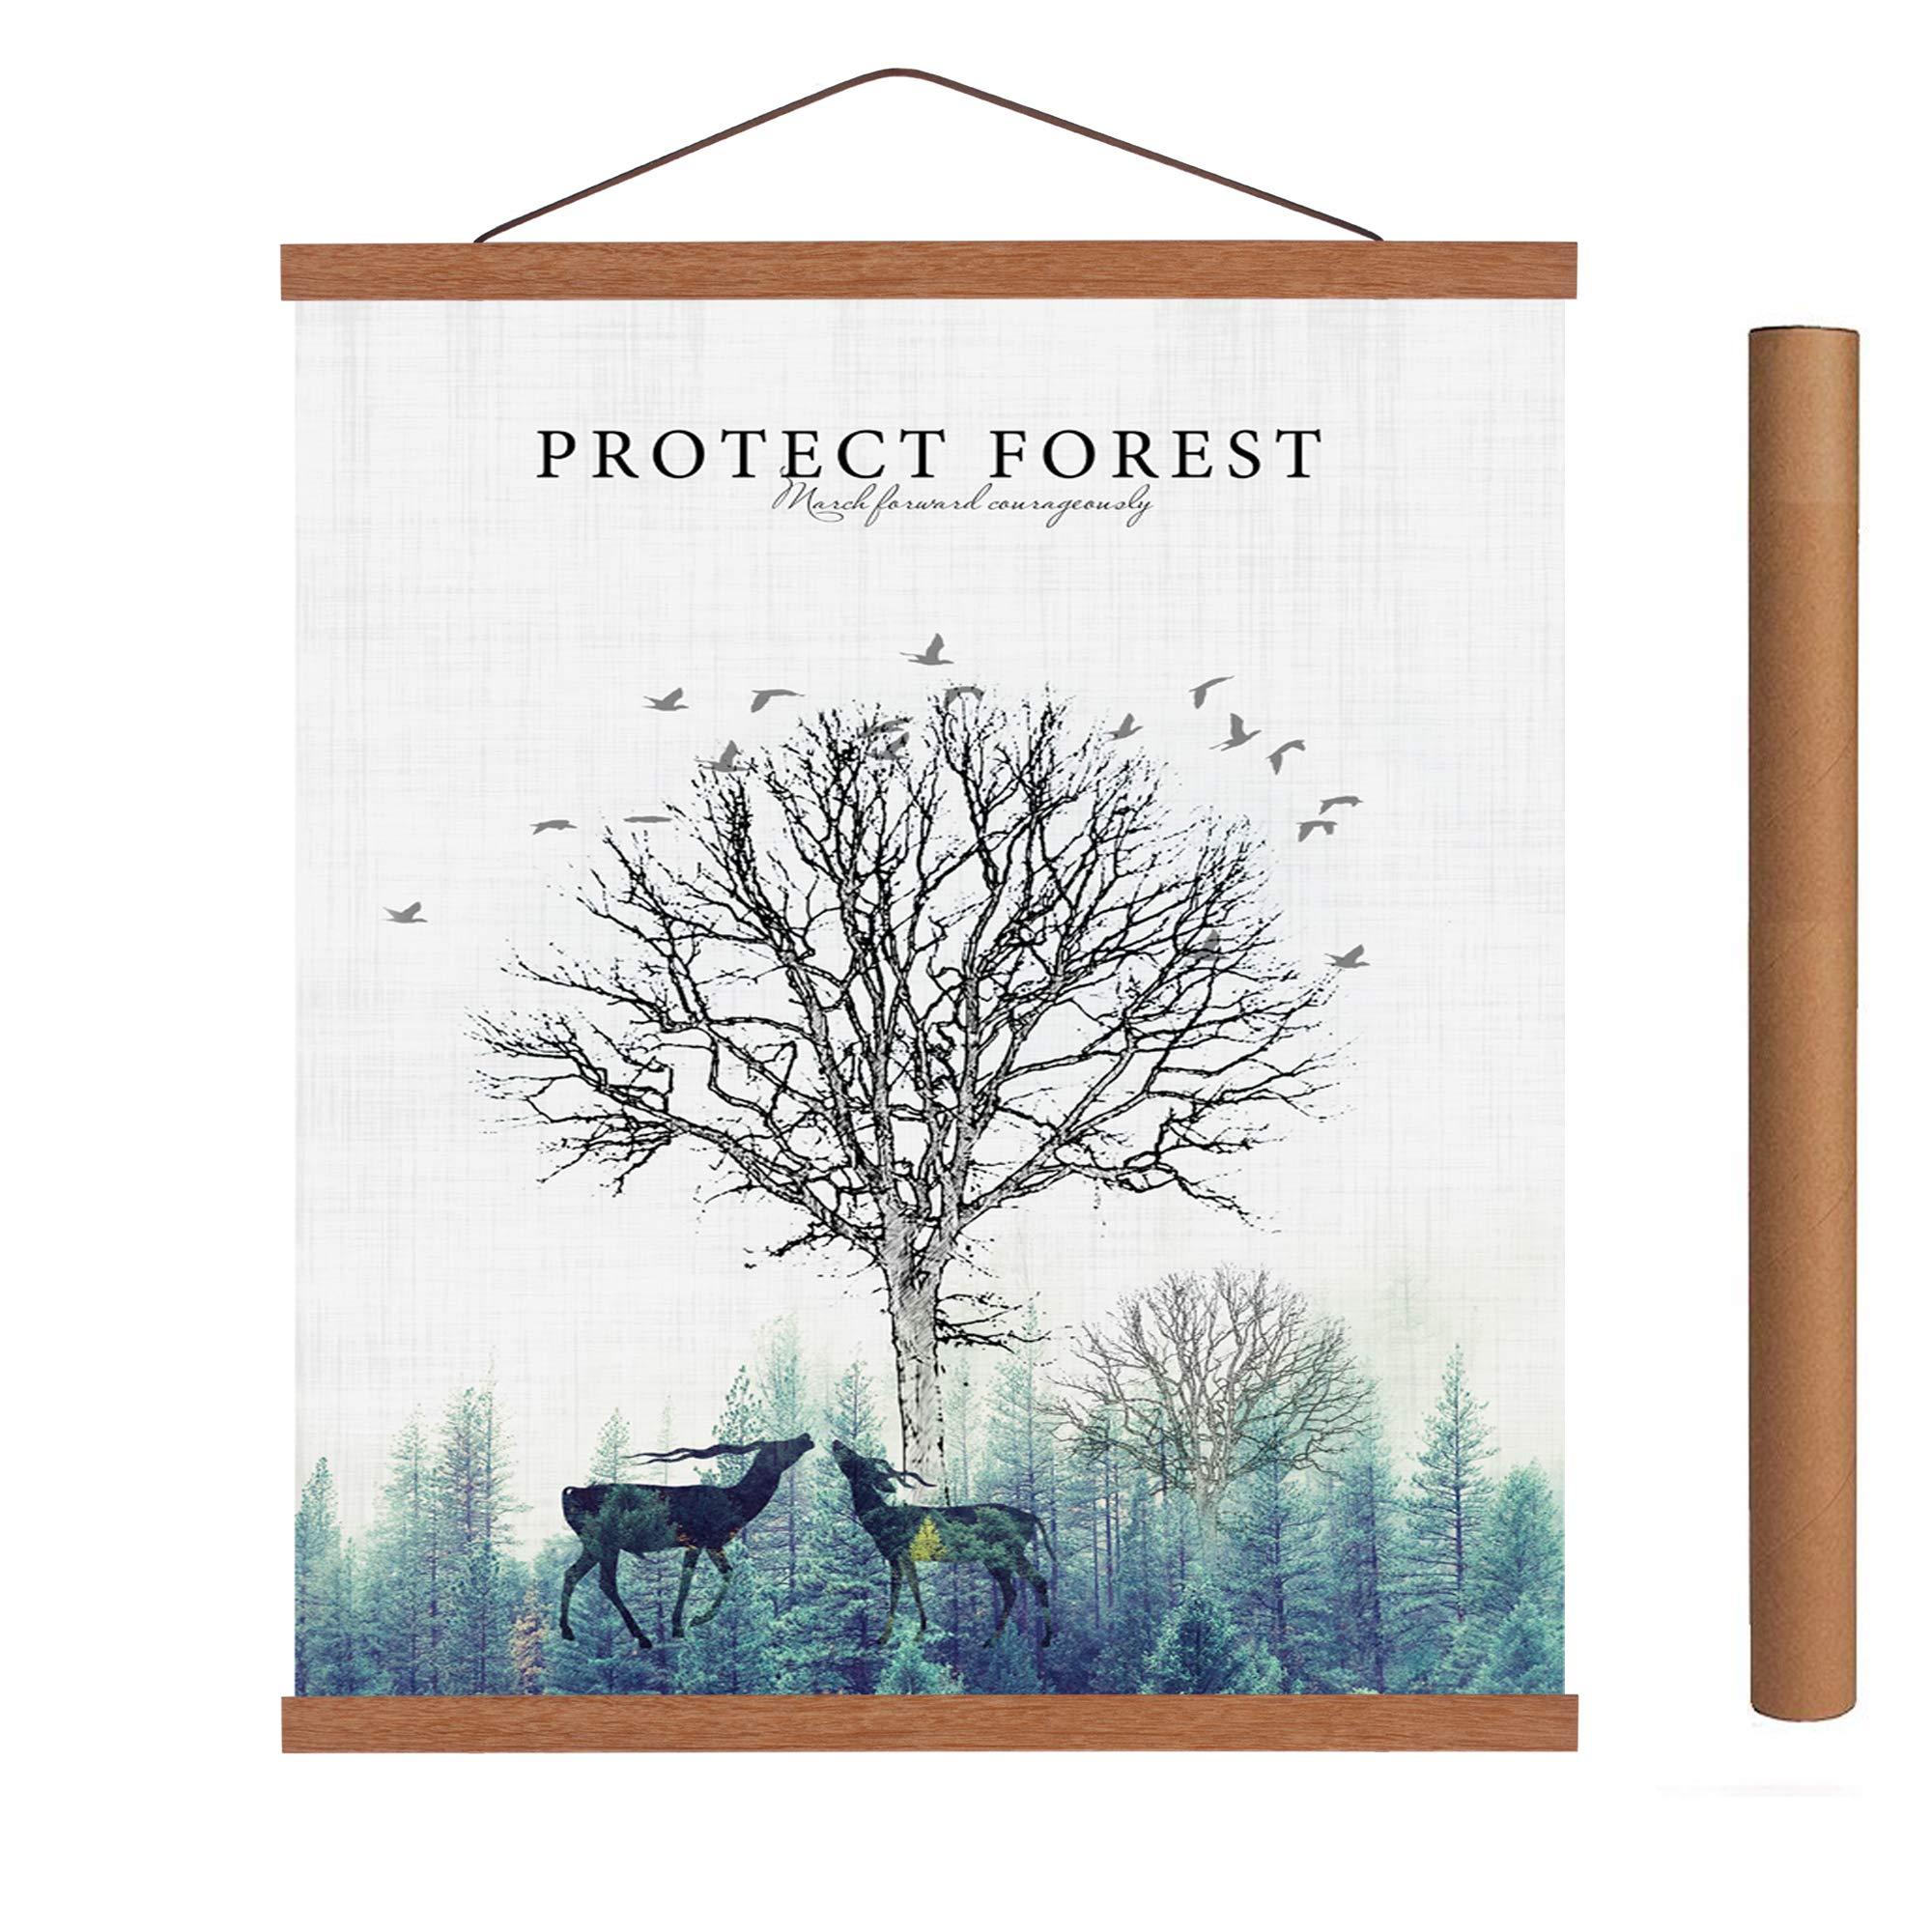 Mookgro 22'' Teak Poster Frame 22x34 22x28,Light Wood Magnetic Frames Wooden Poster Hanger Hanging Kit for Art Print or Canvas Artwork (55.88cm) by Mookgro